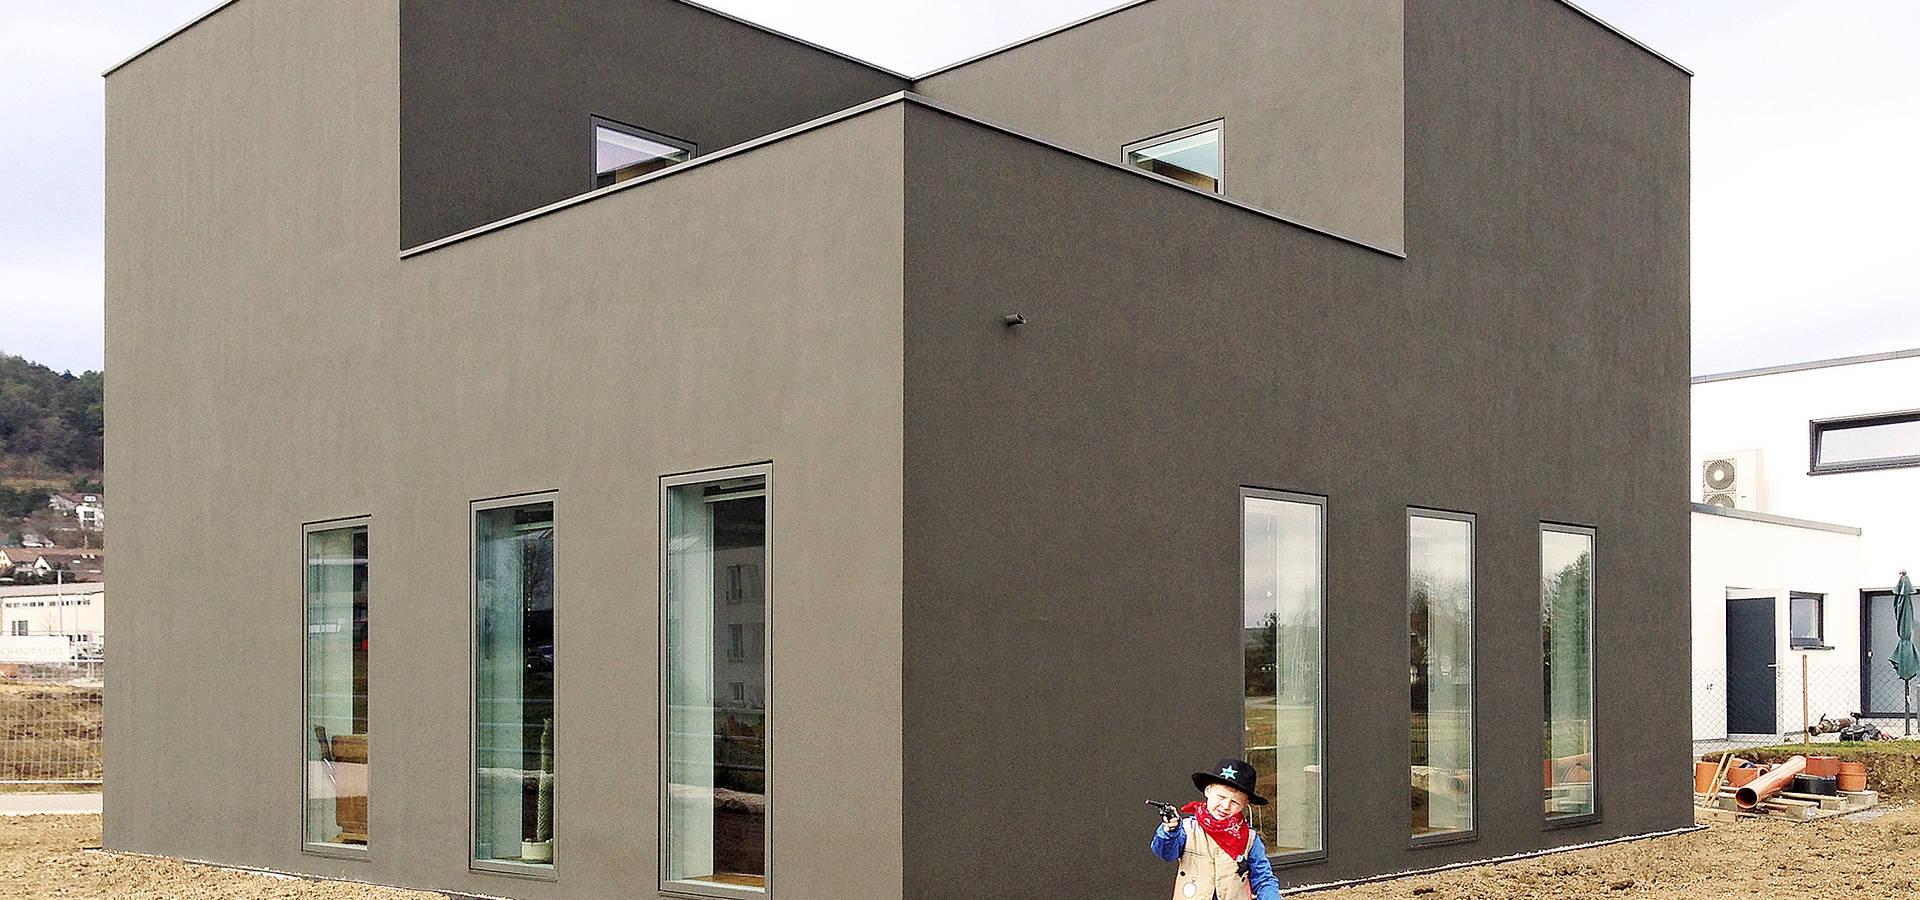 f m b architekten—Norman Binder & Andreas-Thomas Mayer